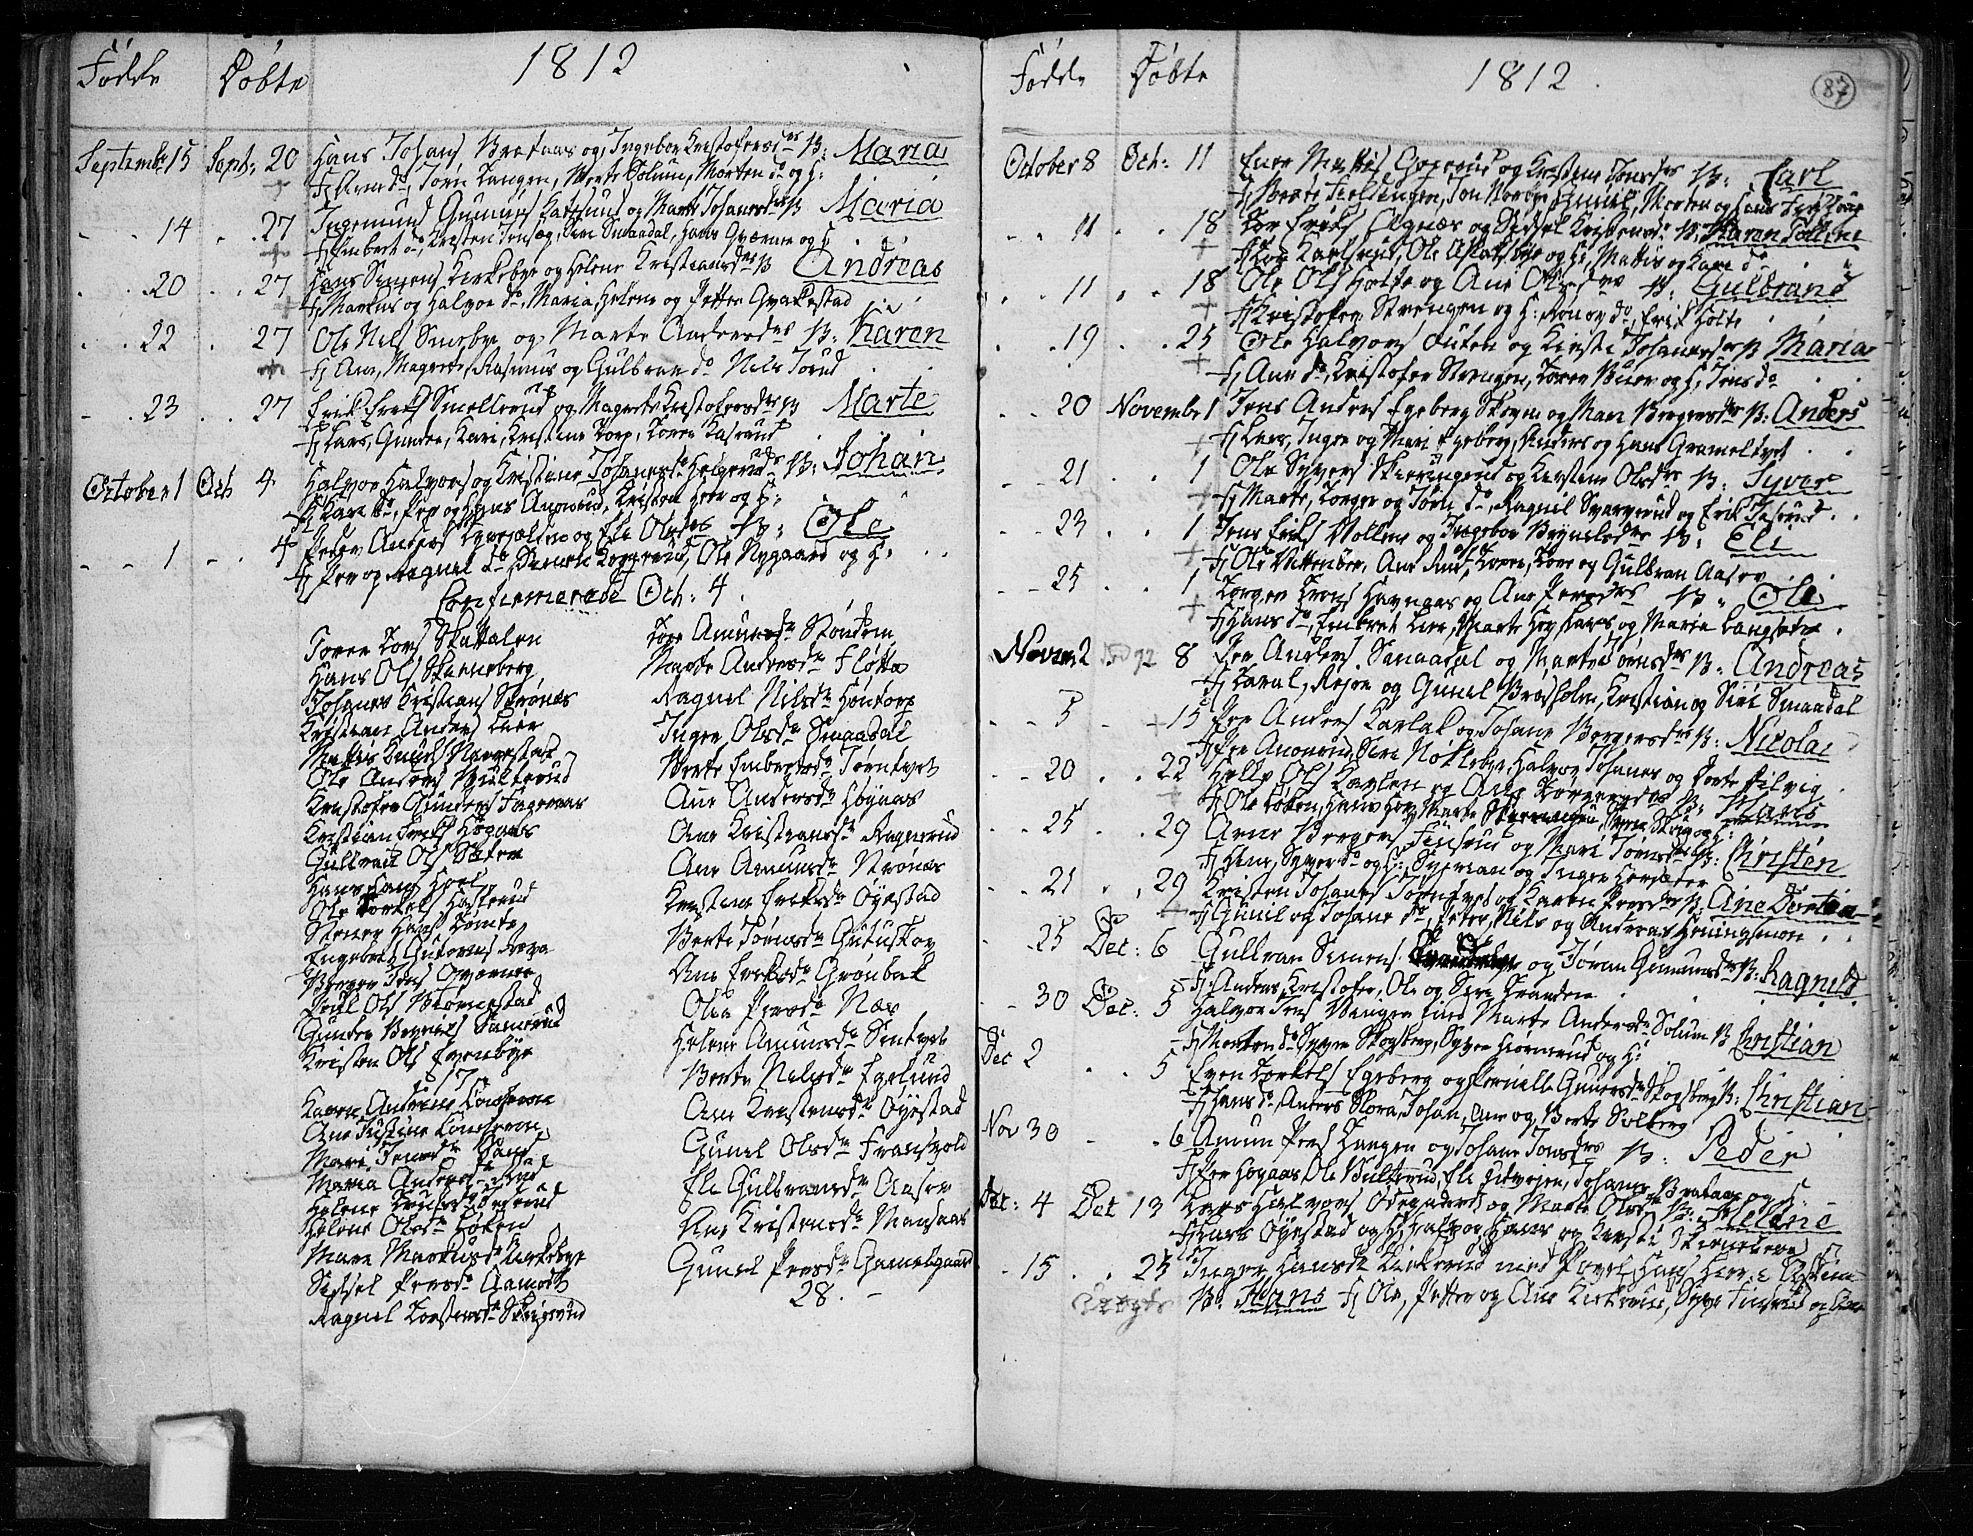 SAO, Trøgstad prestekontor Kirkebøker, F/Fa/L0005: Parish register (official) no. I 5, 1784-1814, p. 87